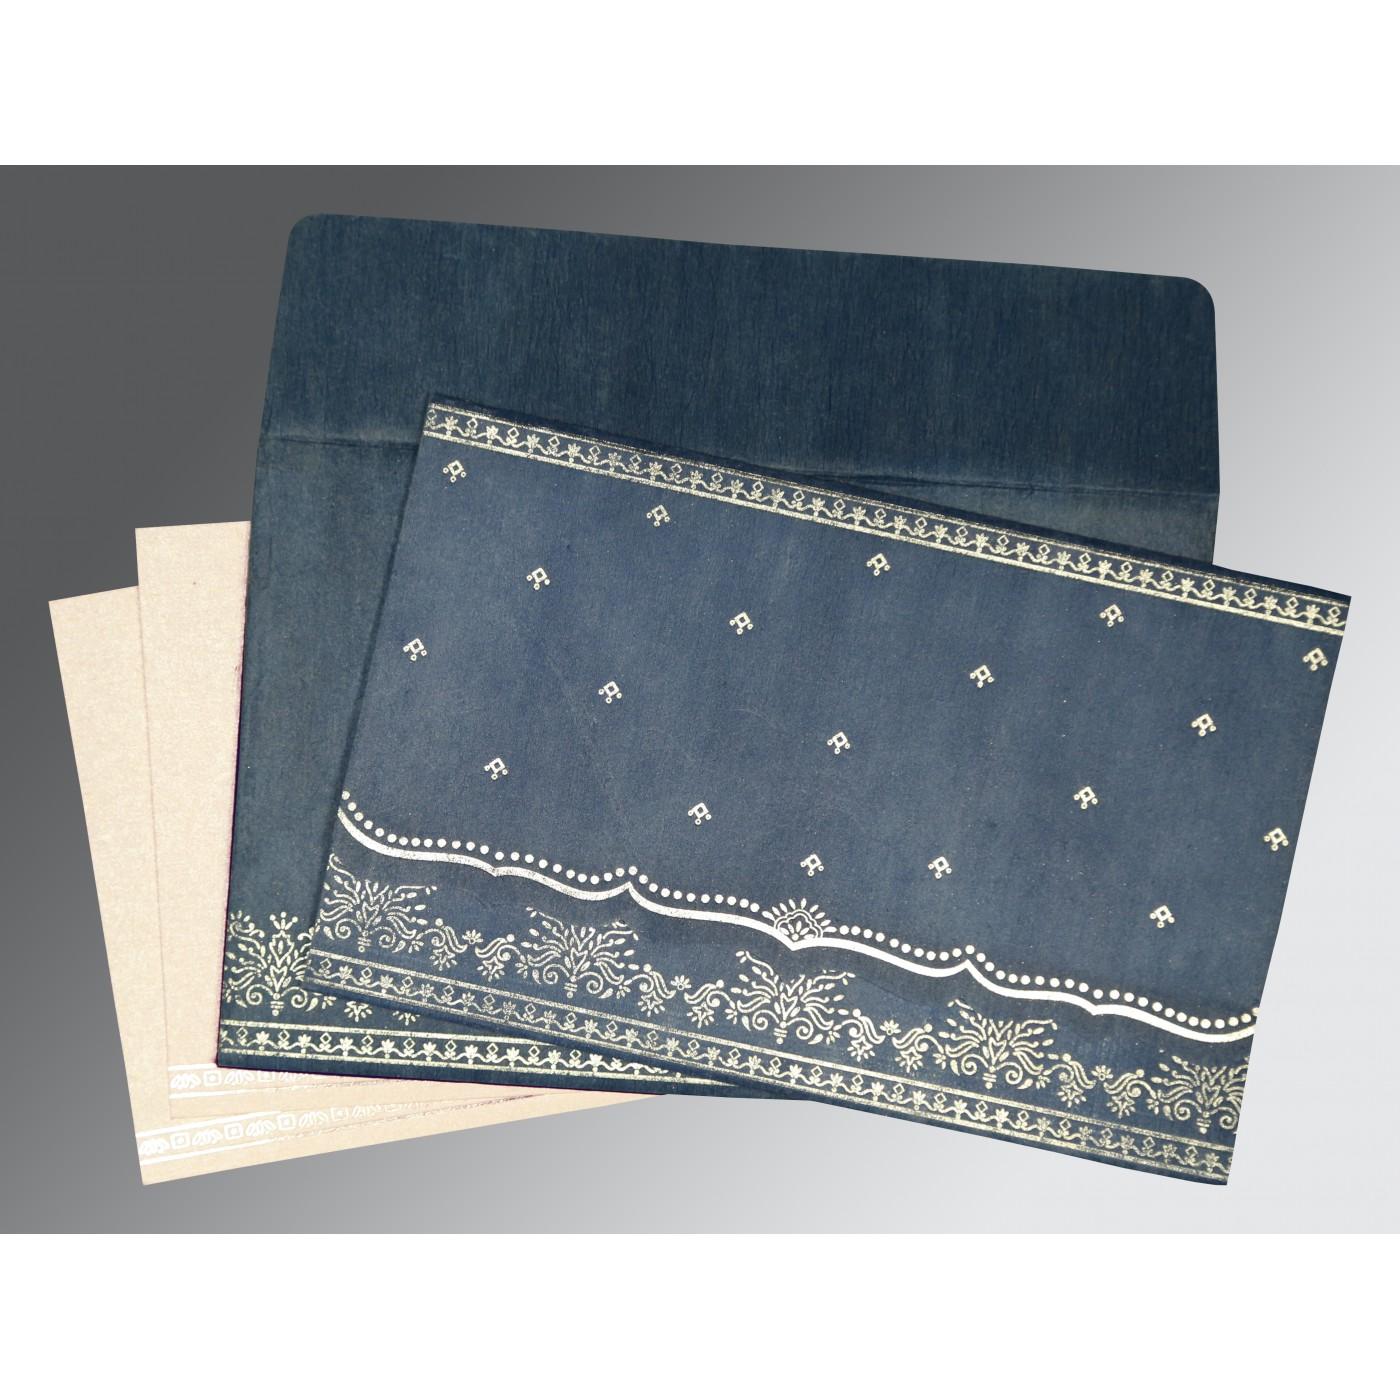 SMOKE BLUE WOOLY FOIL STAMPED WEDDING INVITATION : C-8241P - 123WeddingCards